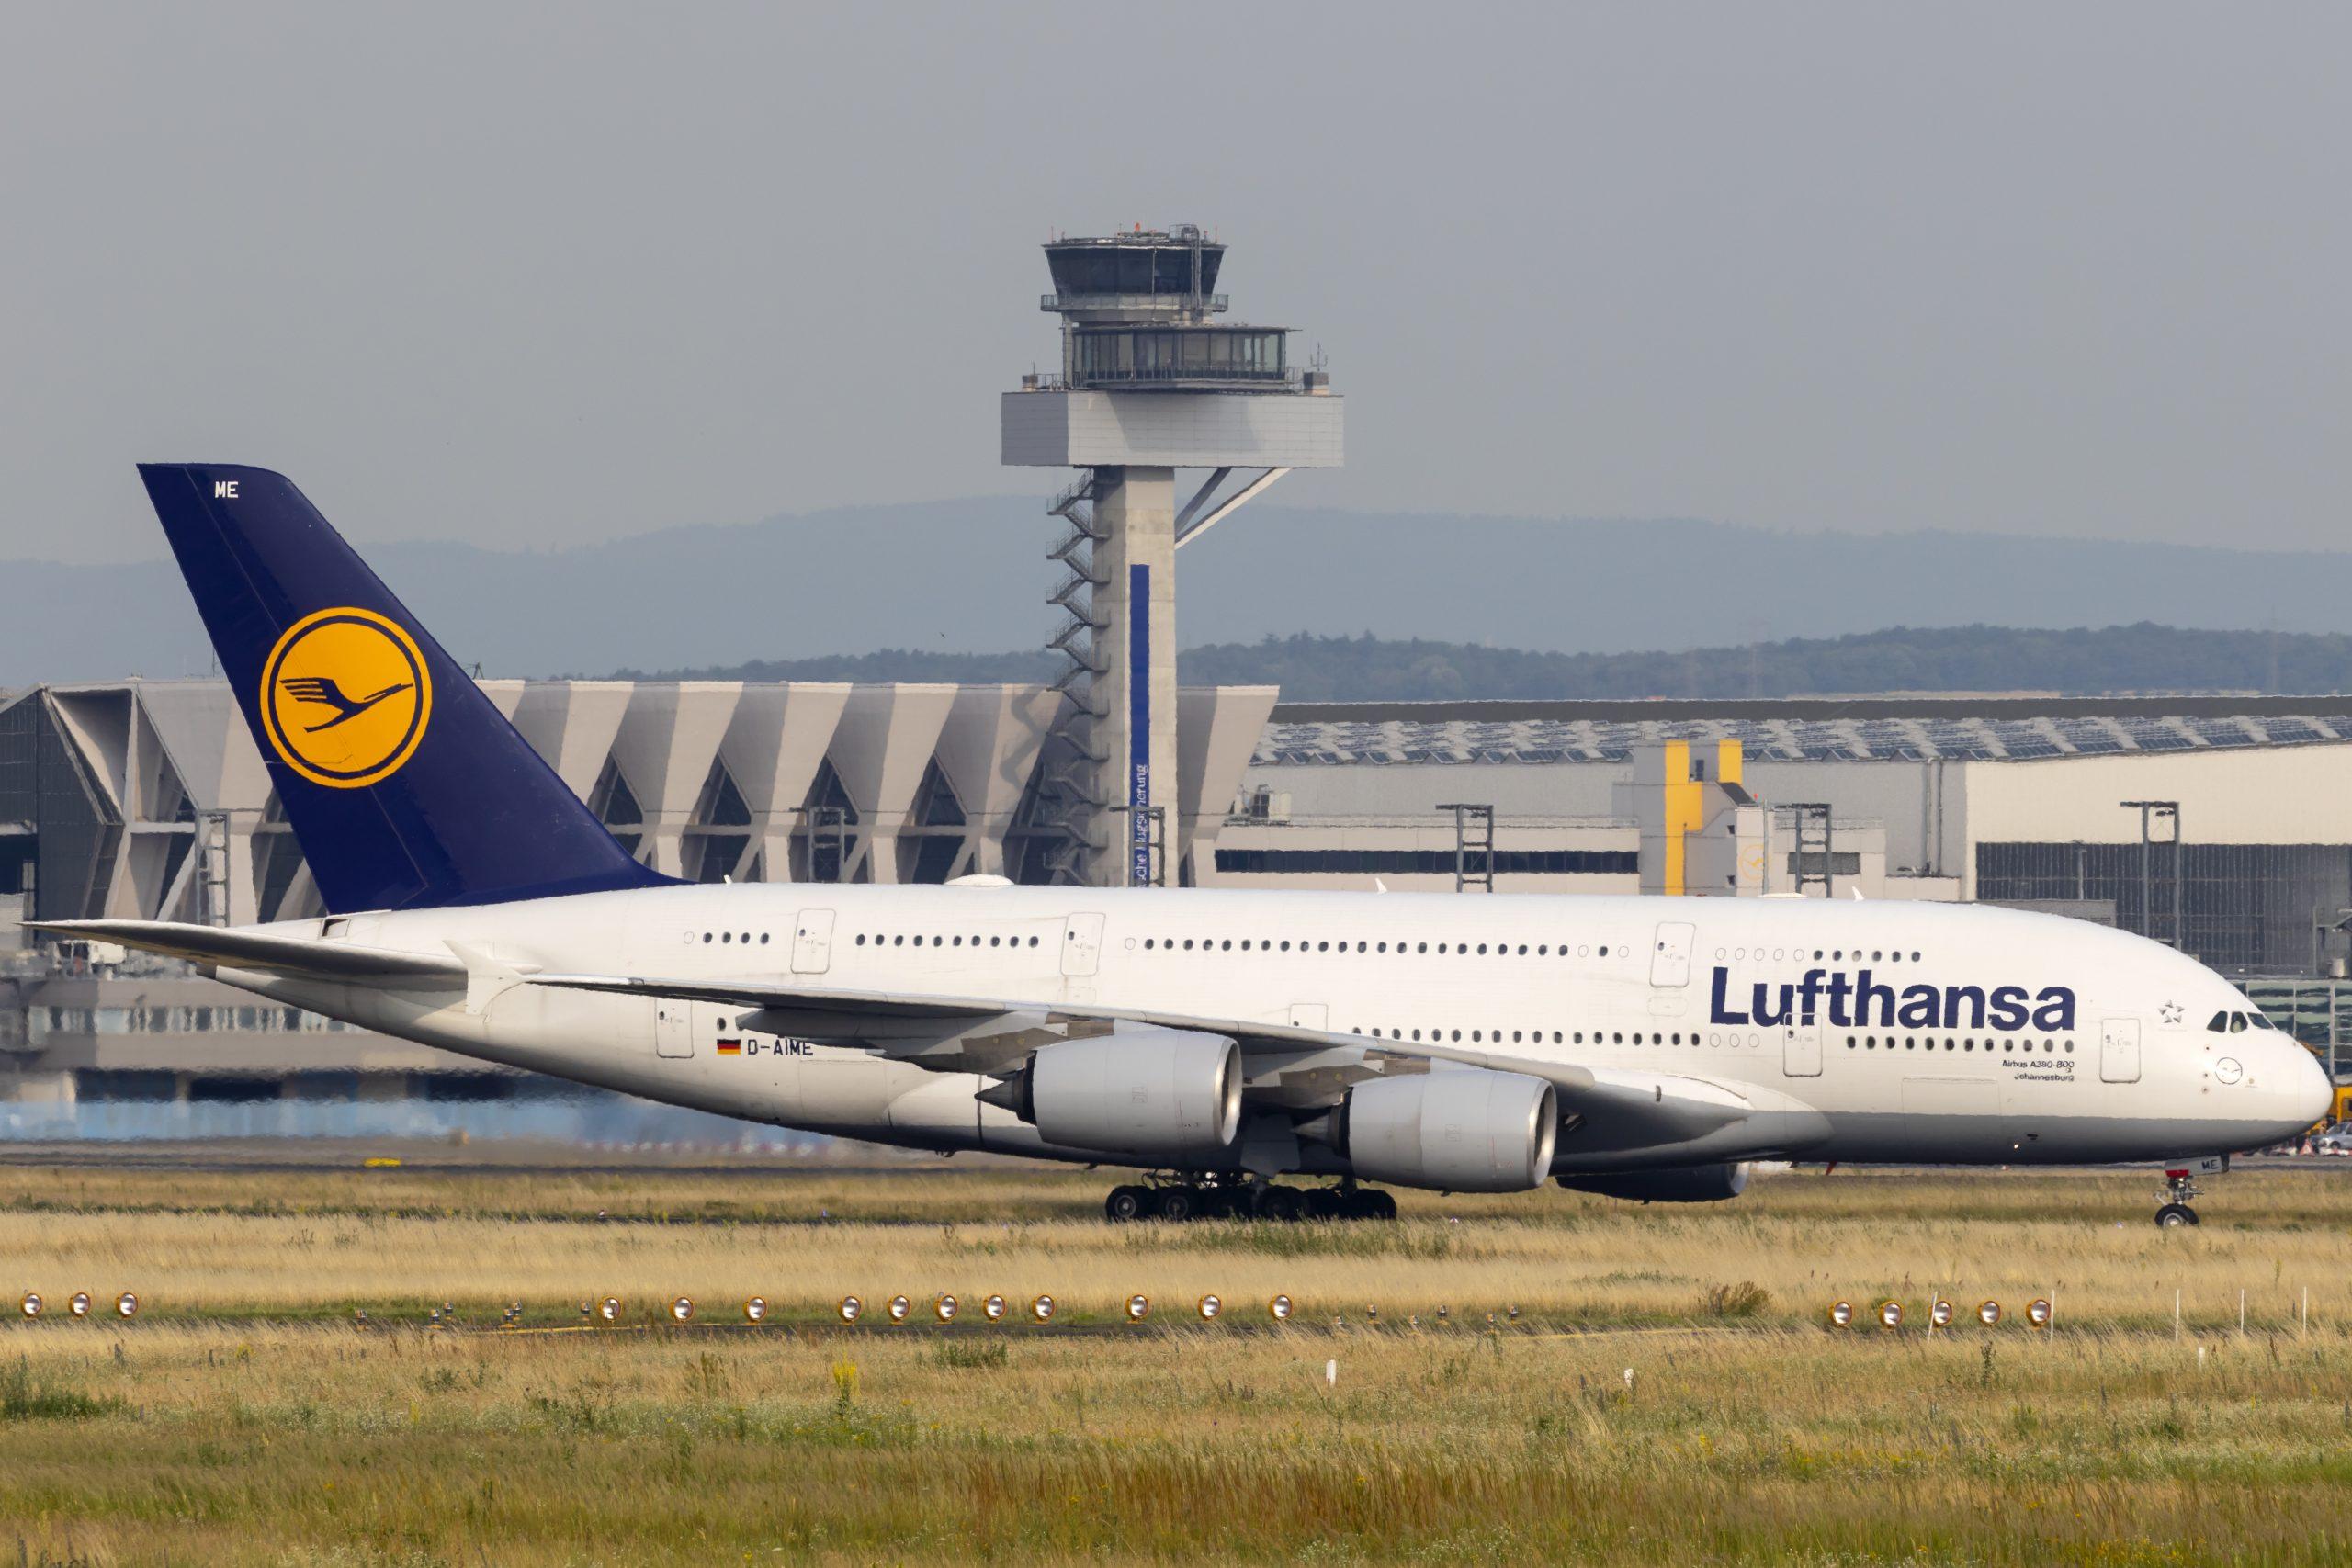 En Airbus A380-800 fra Lufthansa. Foto: © Thorbjørn Brunander Sund, Danish Aviation Photo